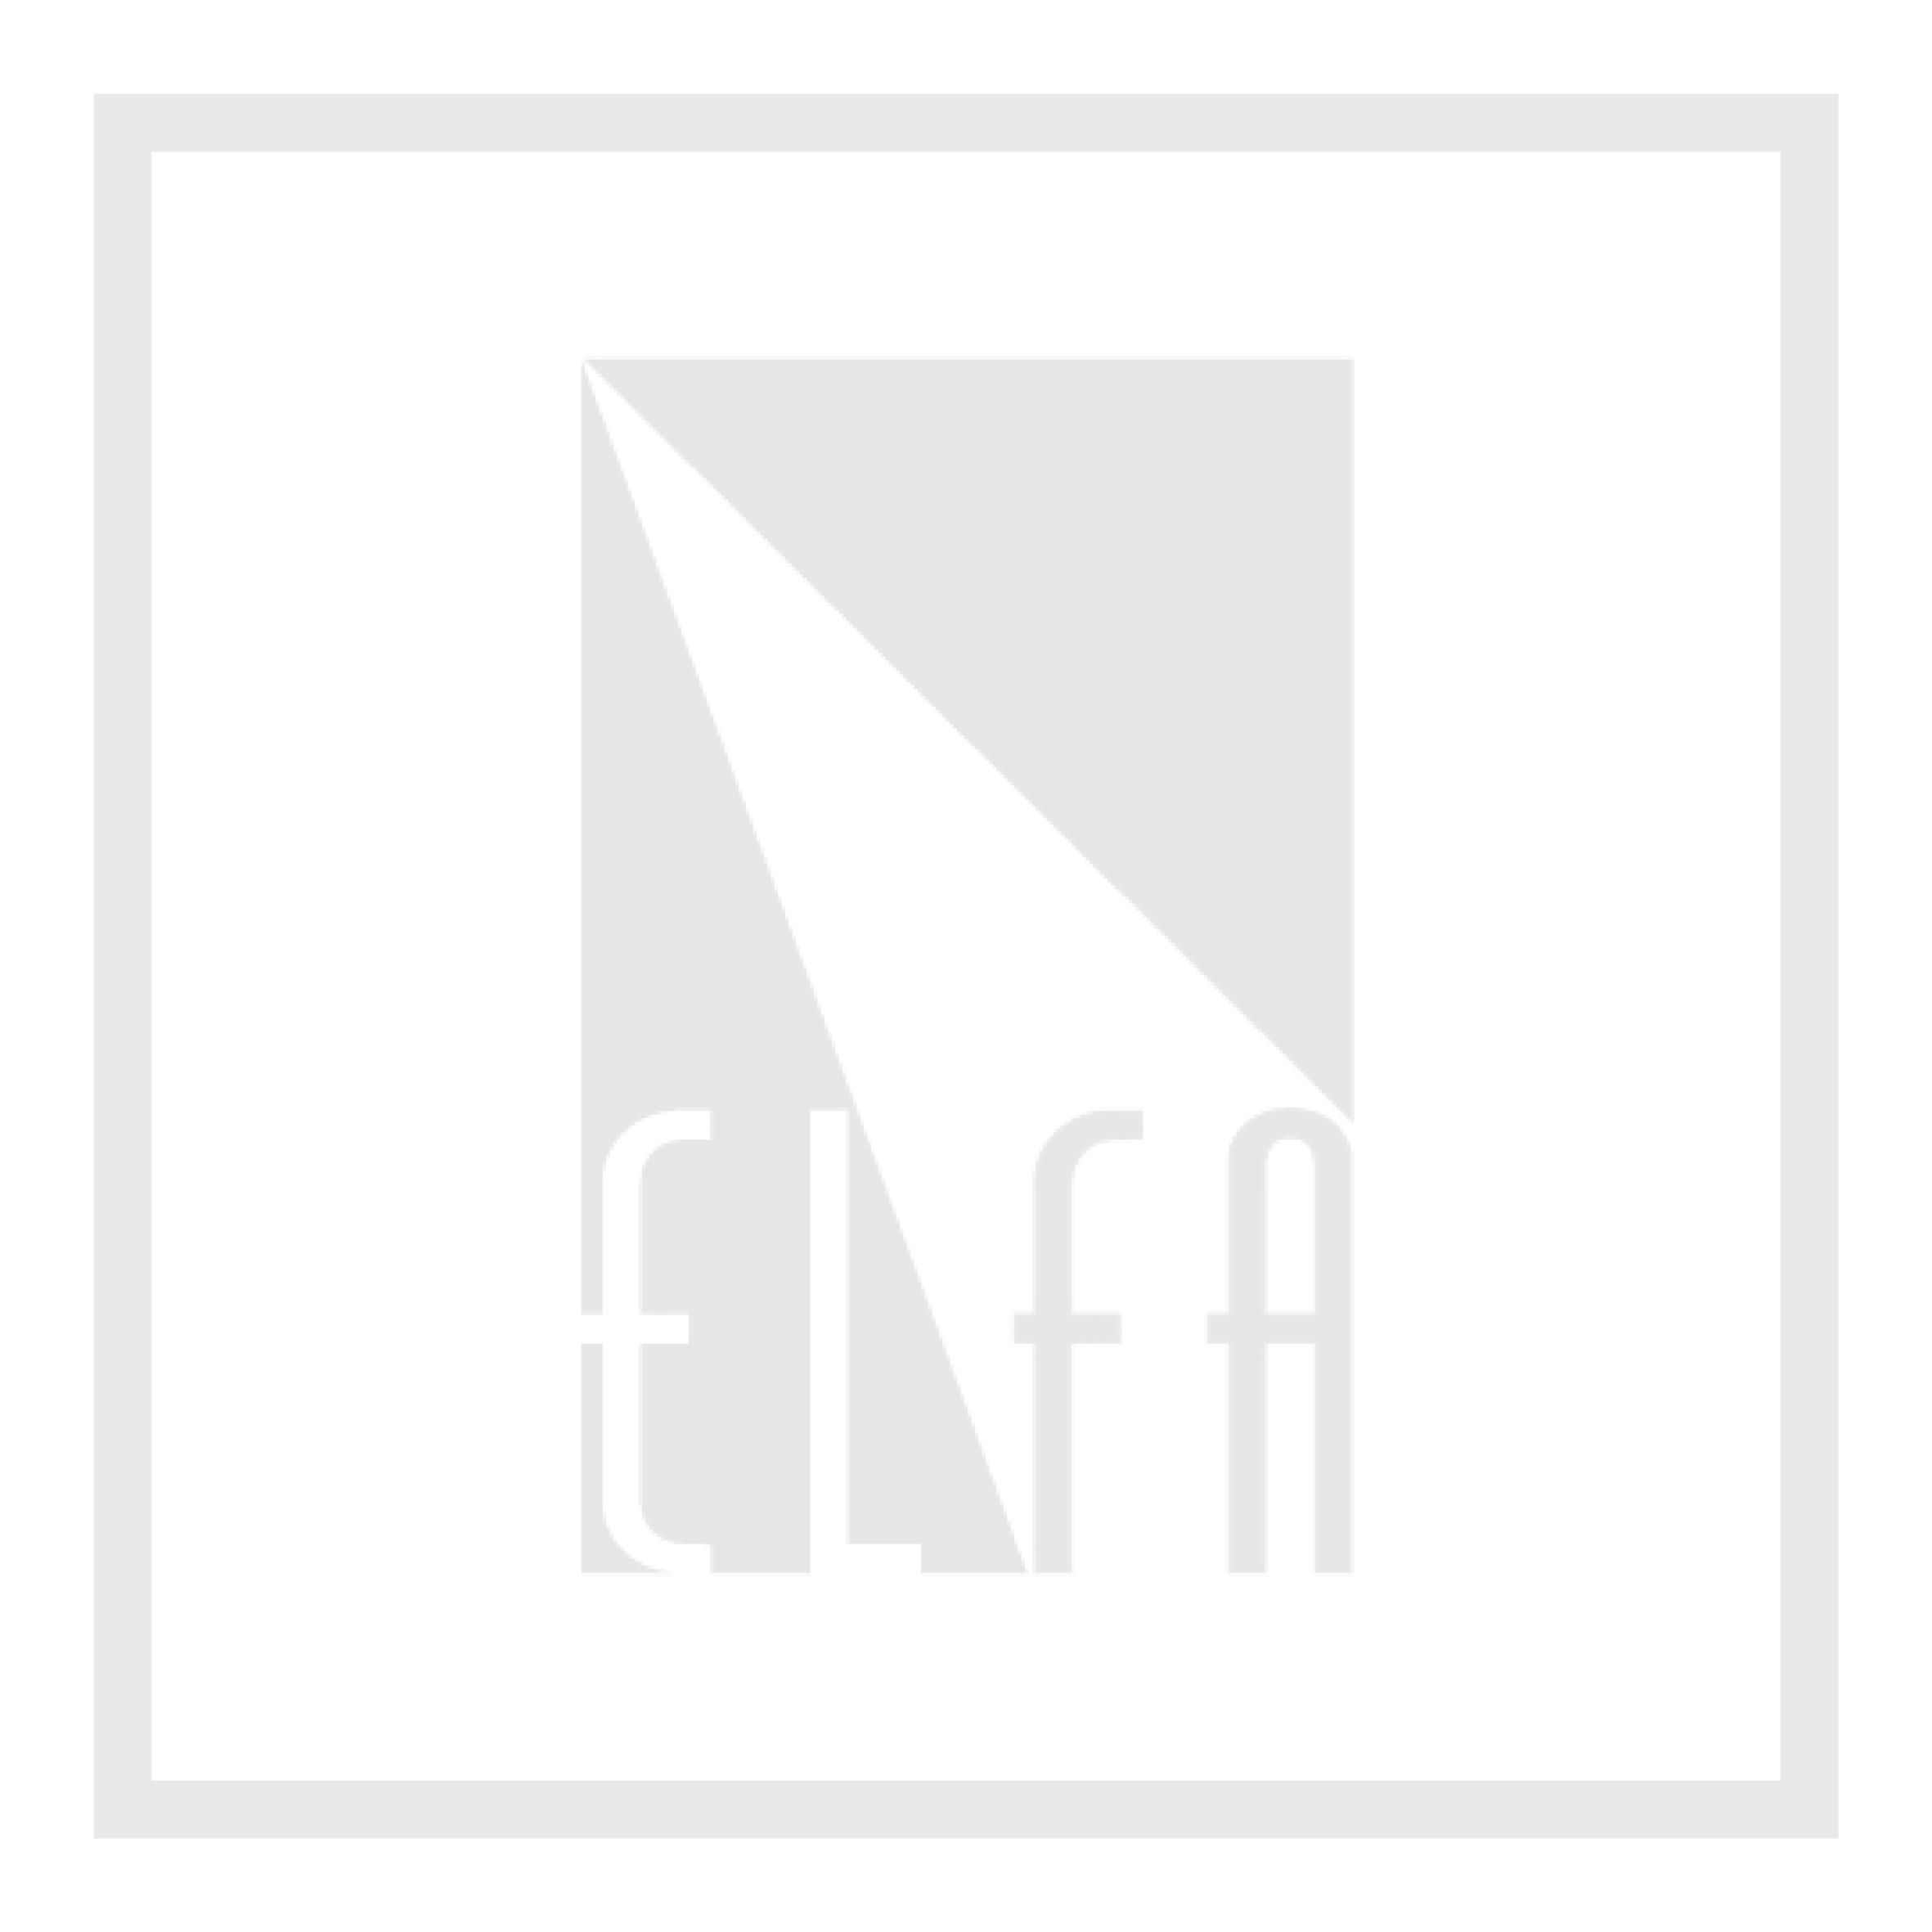 Fiamm Pb accu 12V 9Ah High Rate L151 B65 H94 faston6,3